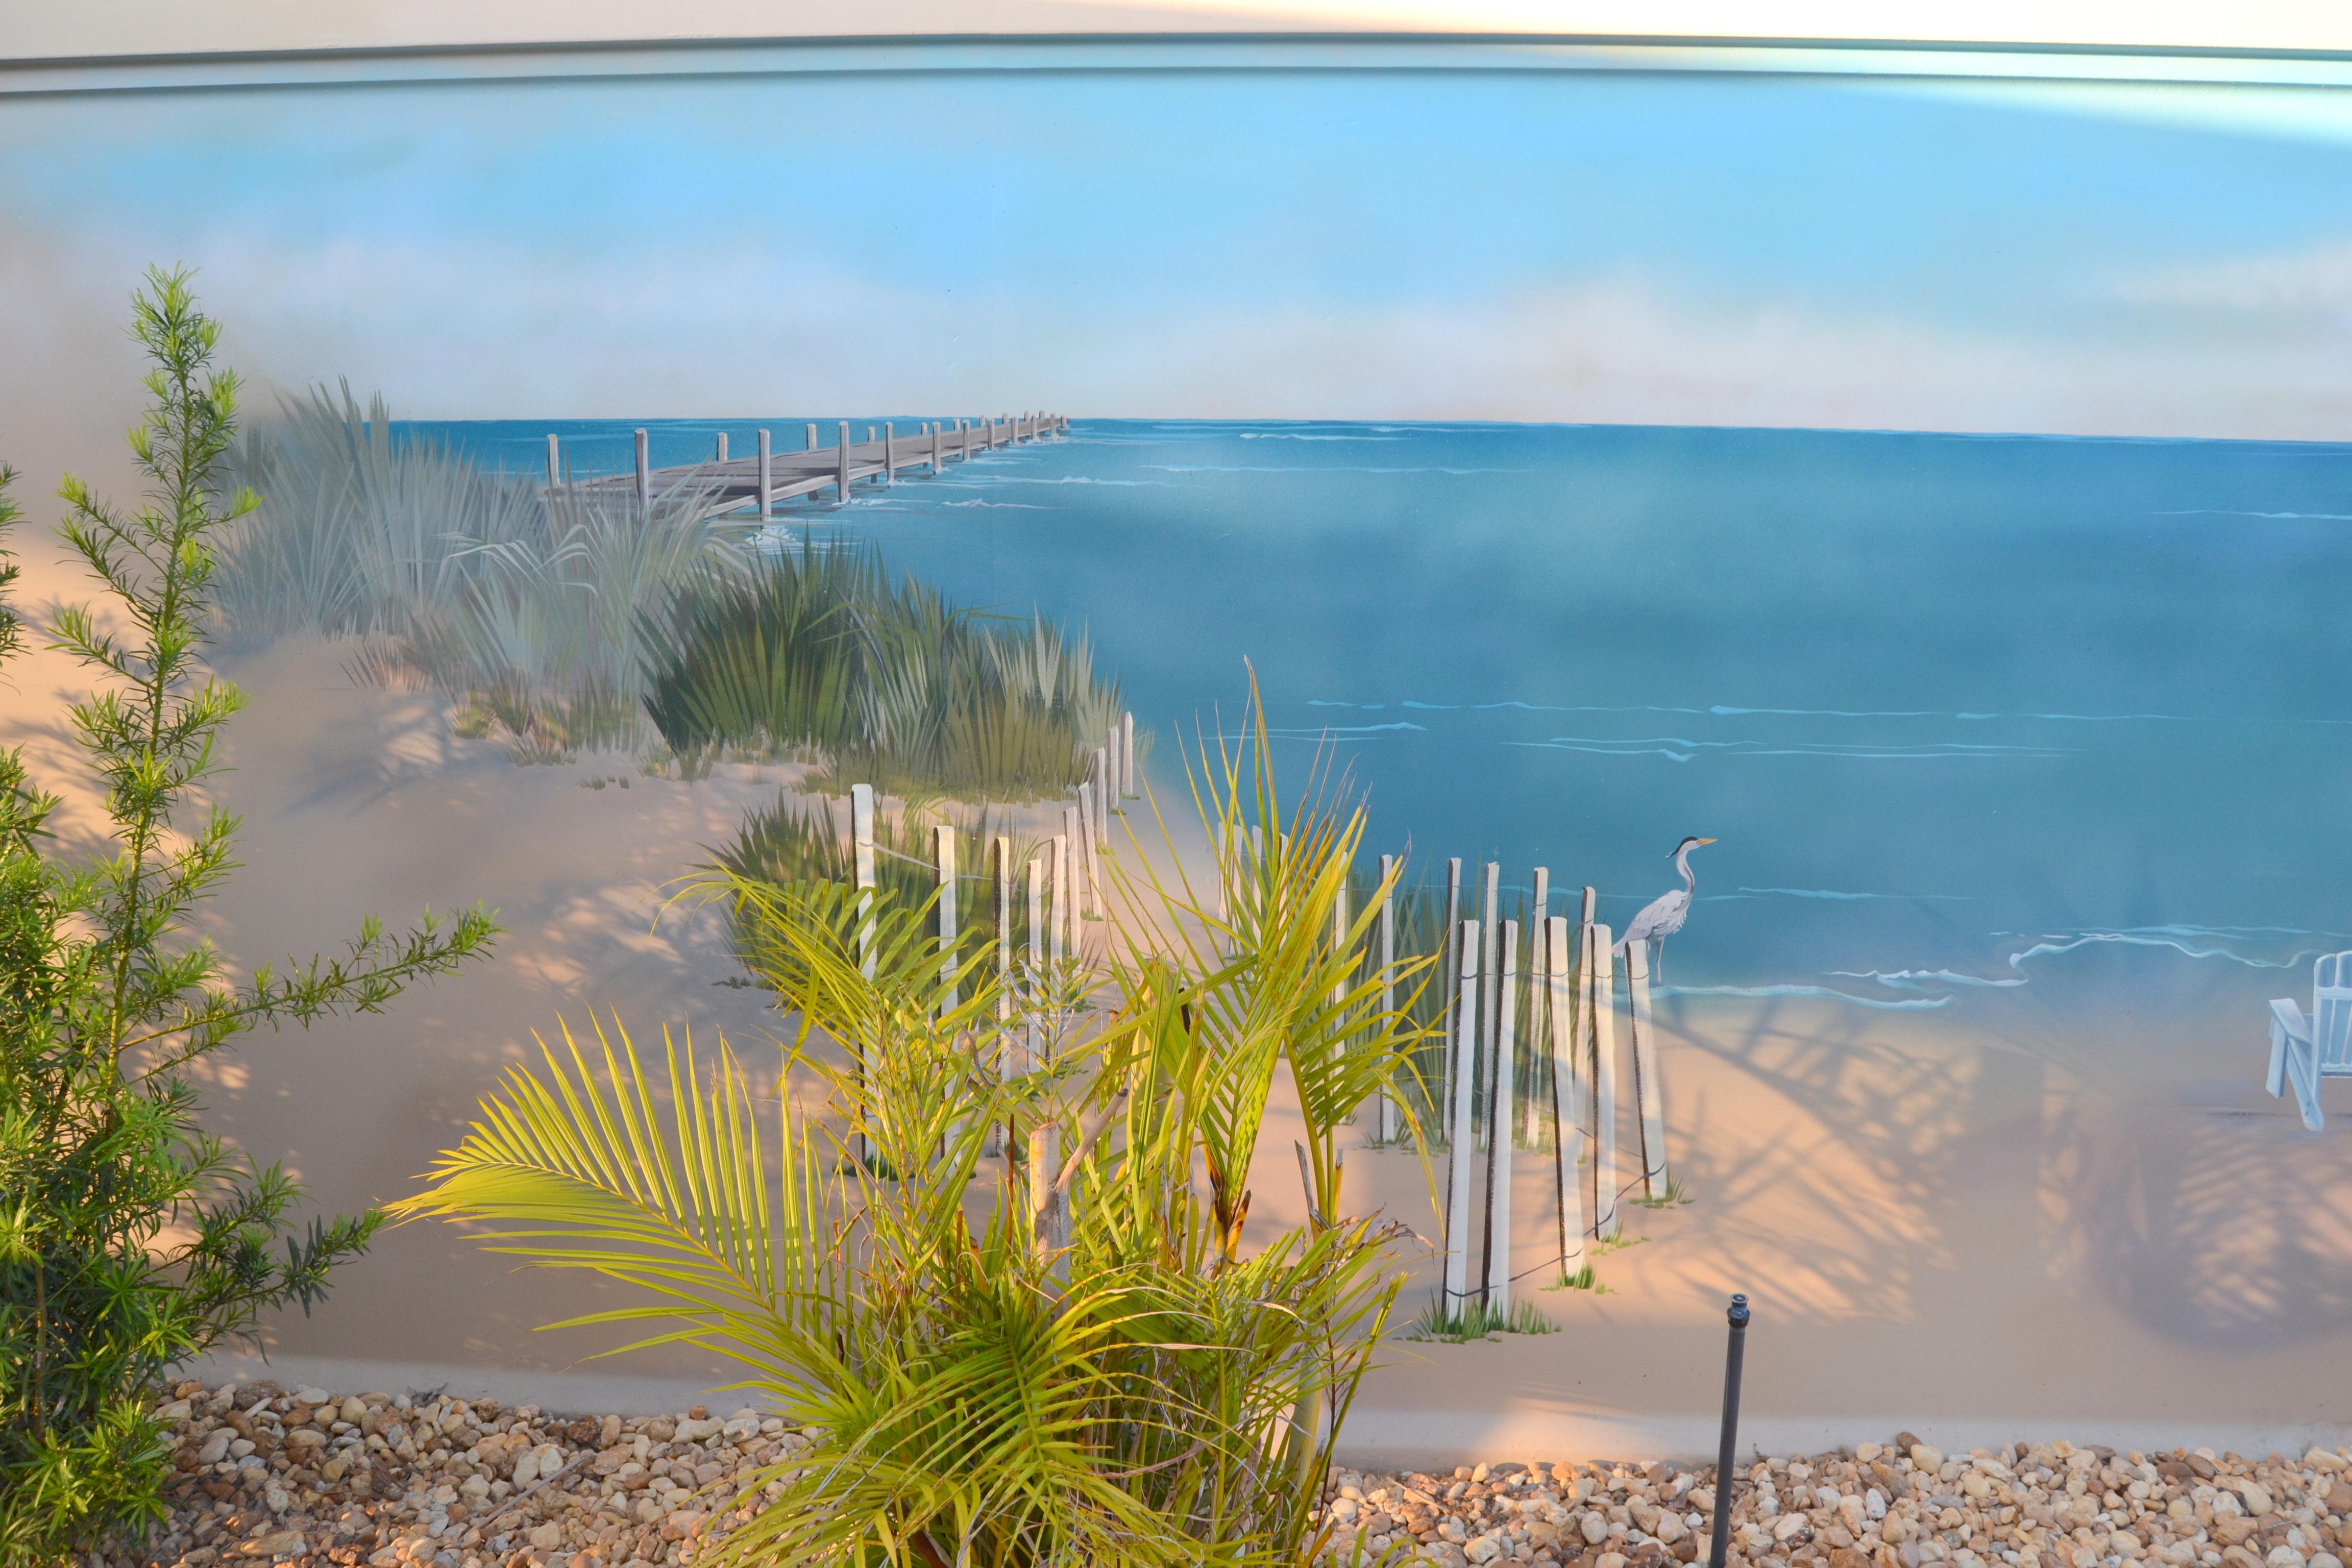 Beach Sand Dunes & Pier